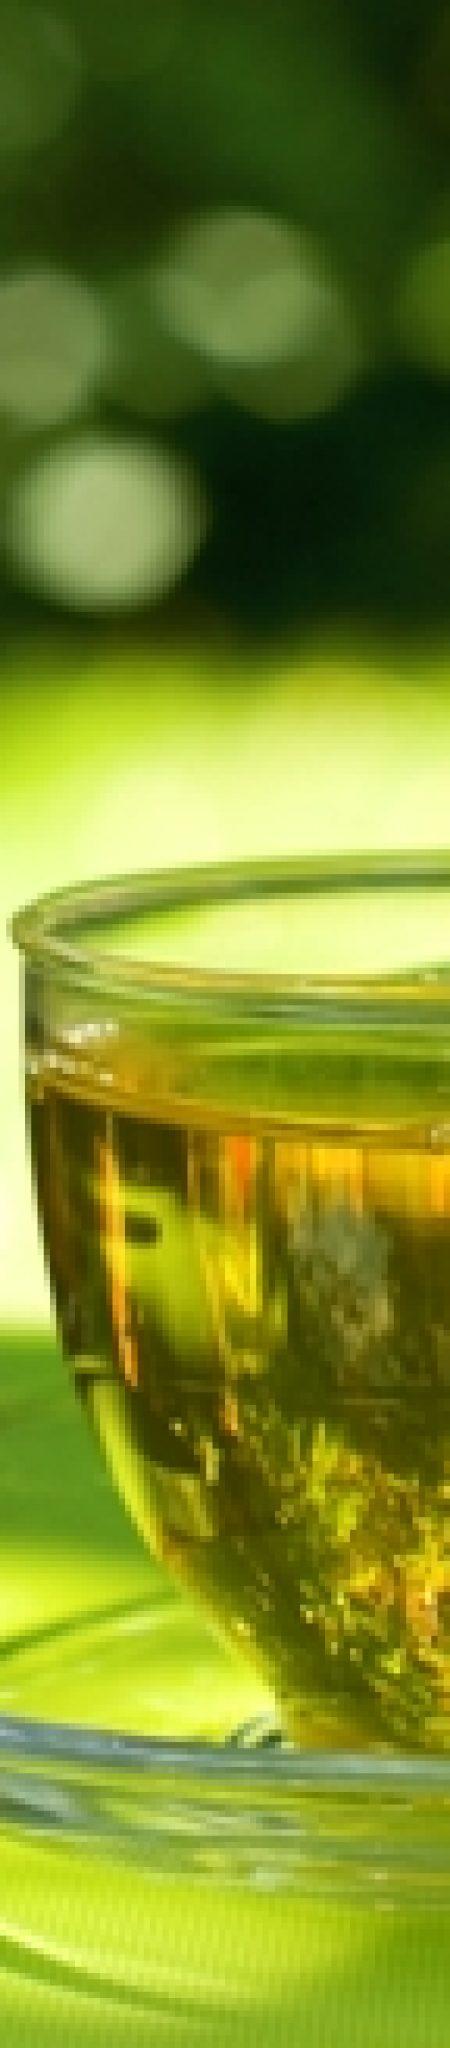 Green-tea Halting Halitosis